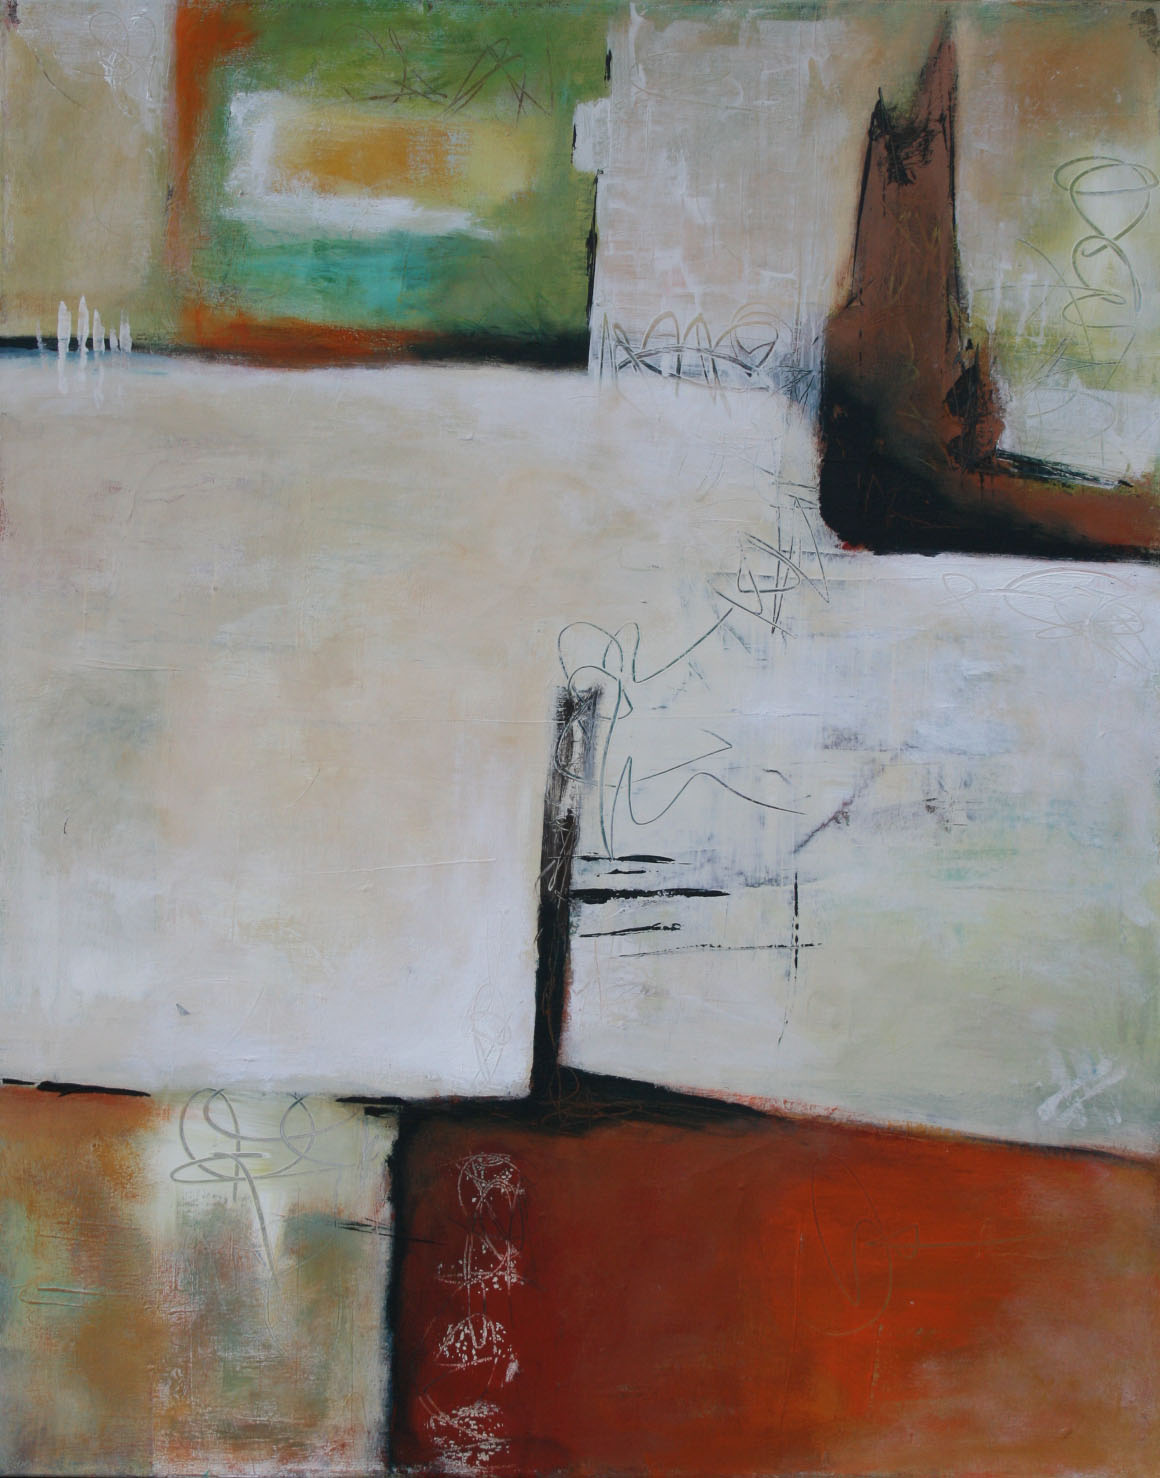 Ohne Titel 1705, Öl und Acryl auf Leinwand, 100 x 80 cm